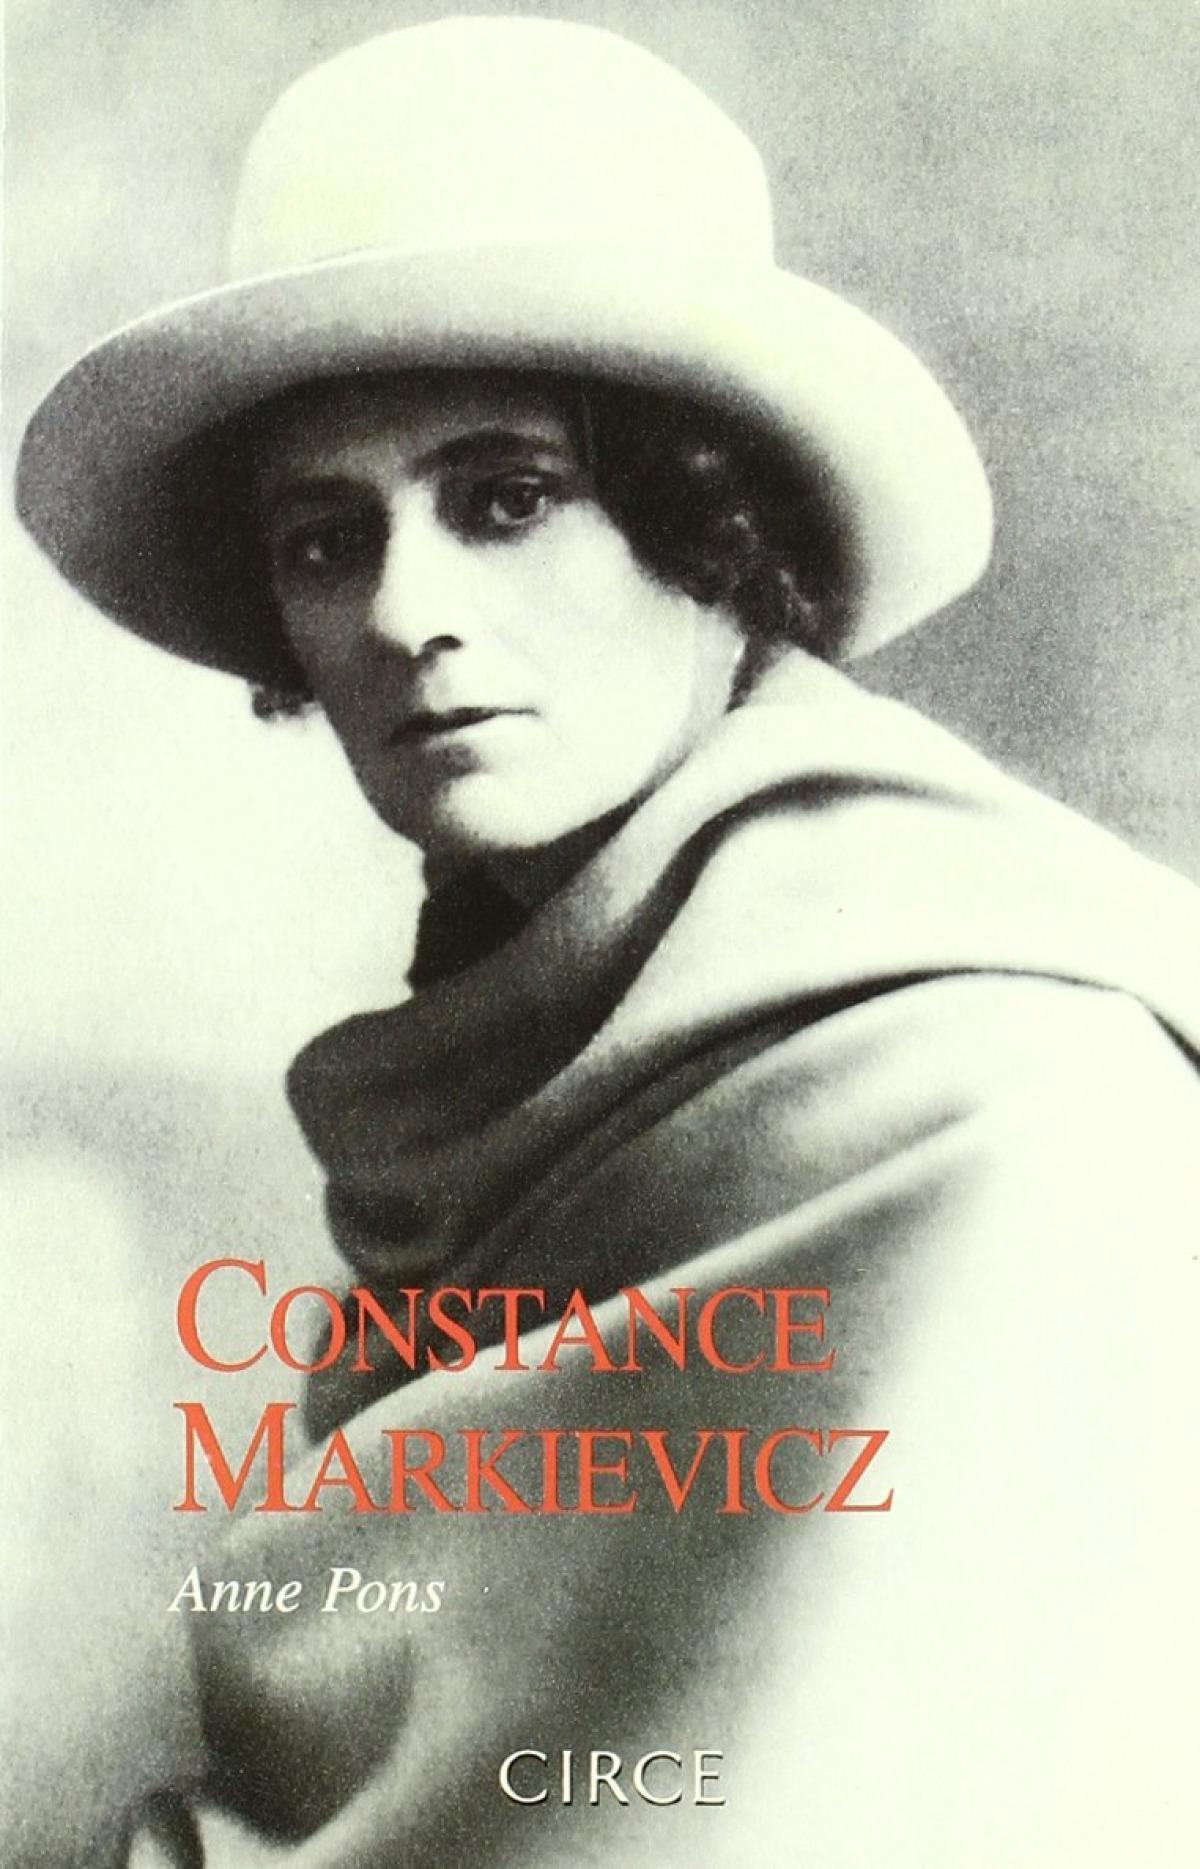 Constance markievicz - Sin Autor